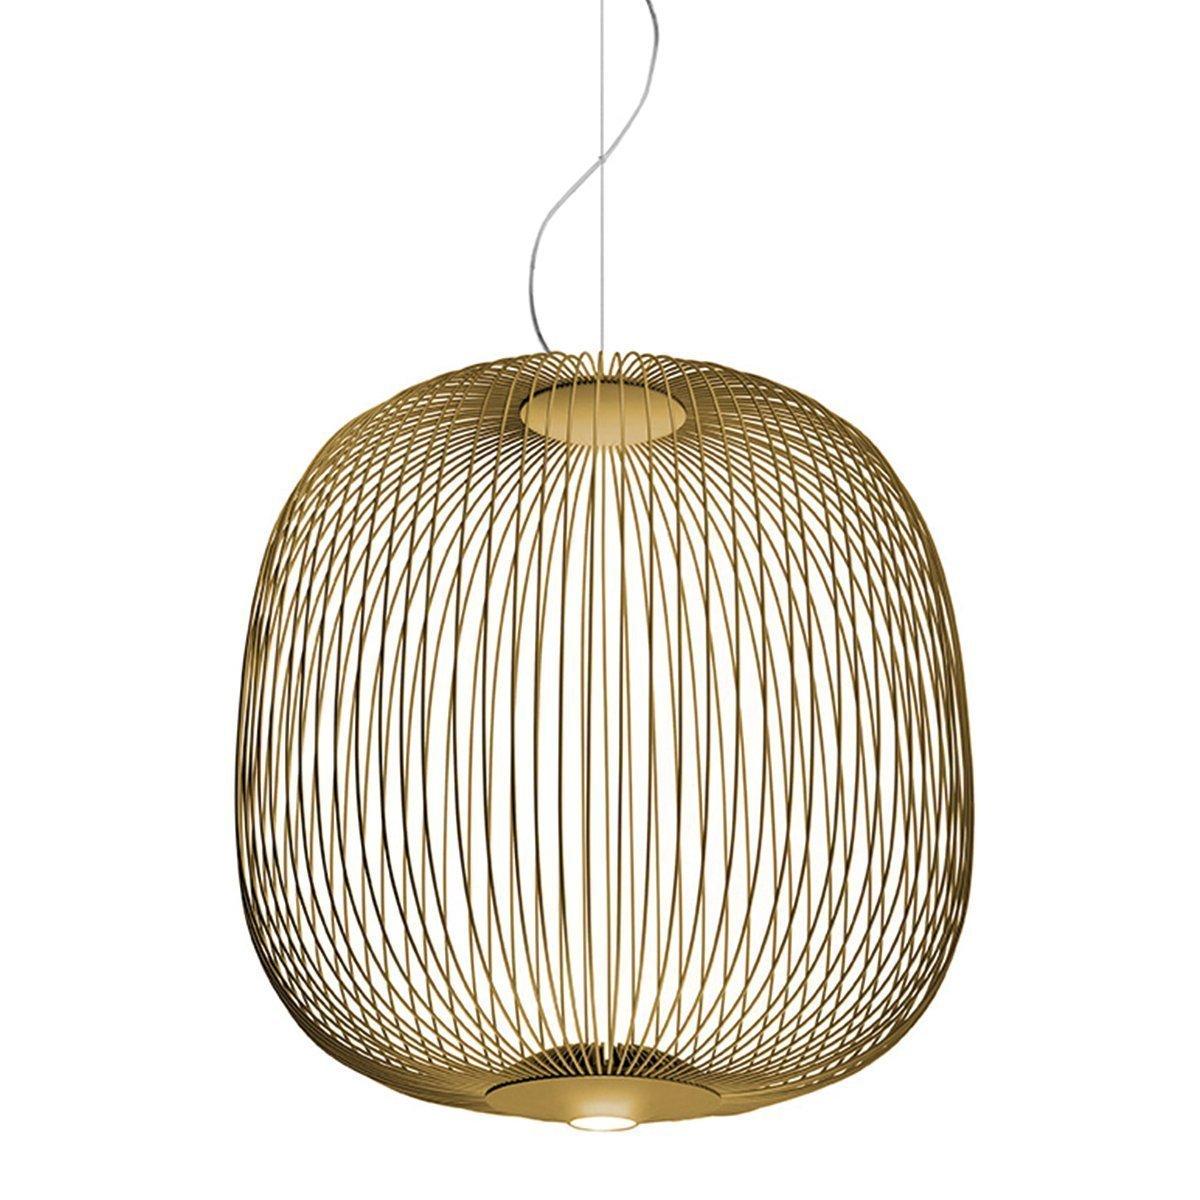 Foscarini Spokes 2 Hanglamp - Goud